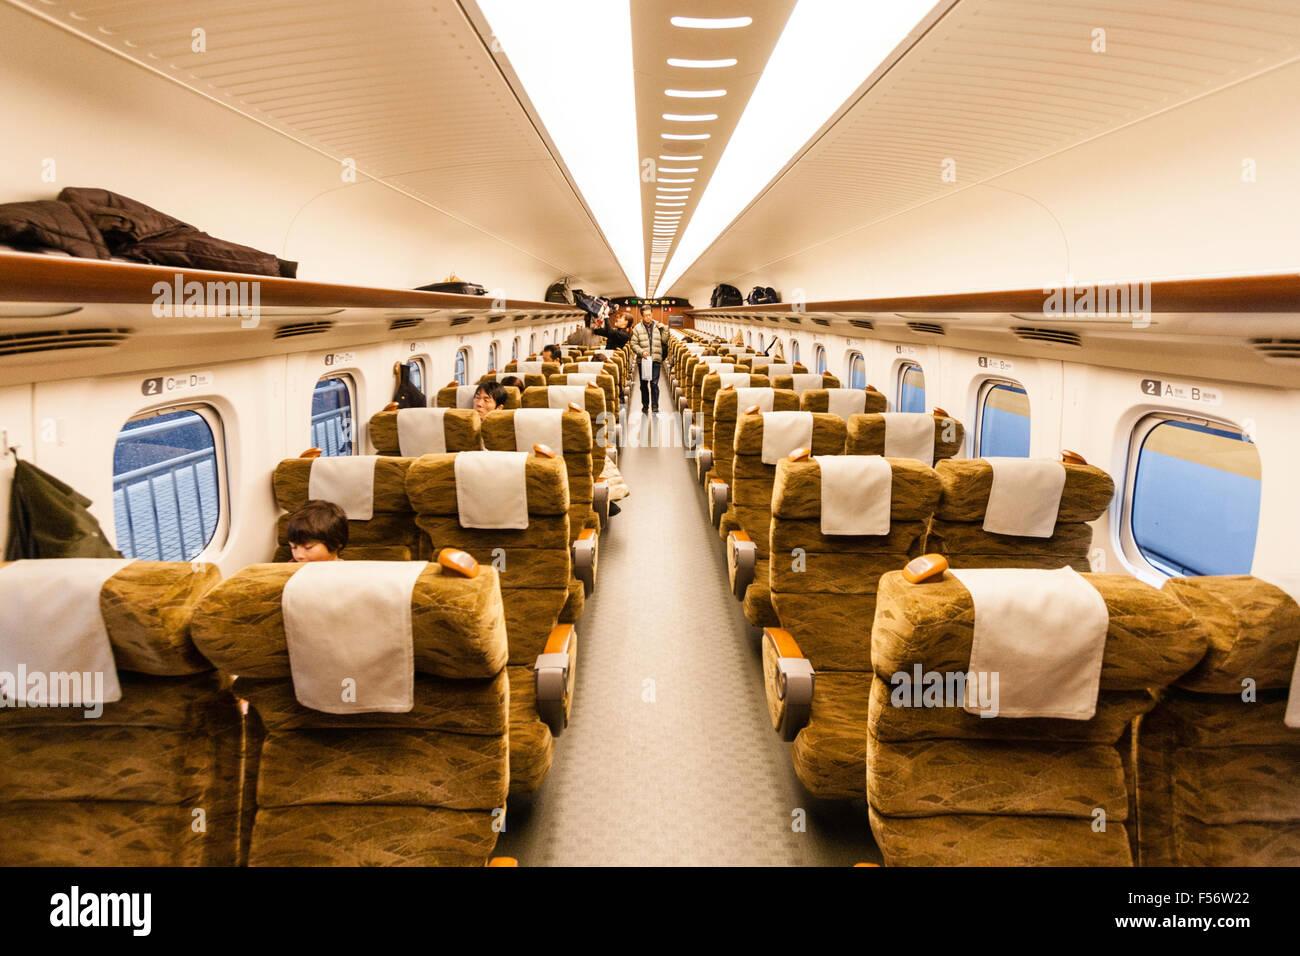 Japanese Shinkansen Bullet Train Interior Showing 2x2 Seating On The Stock Photo